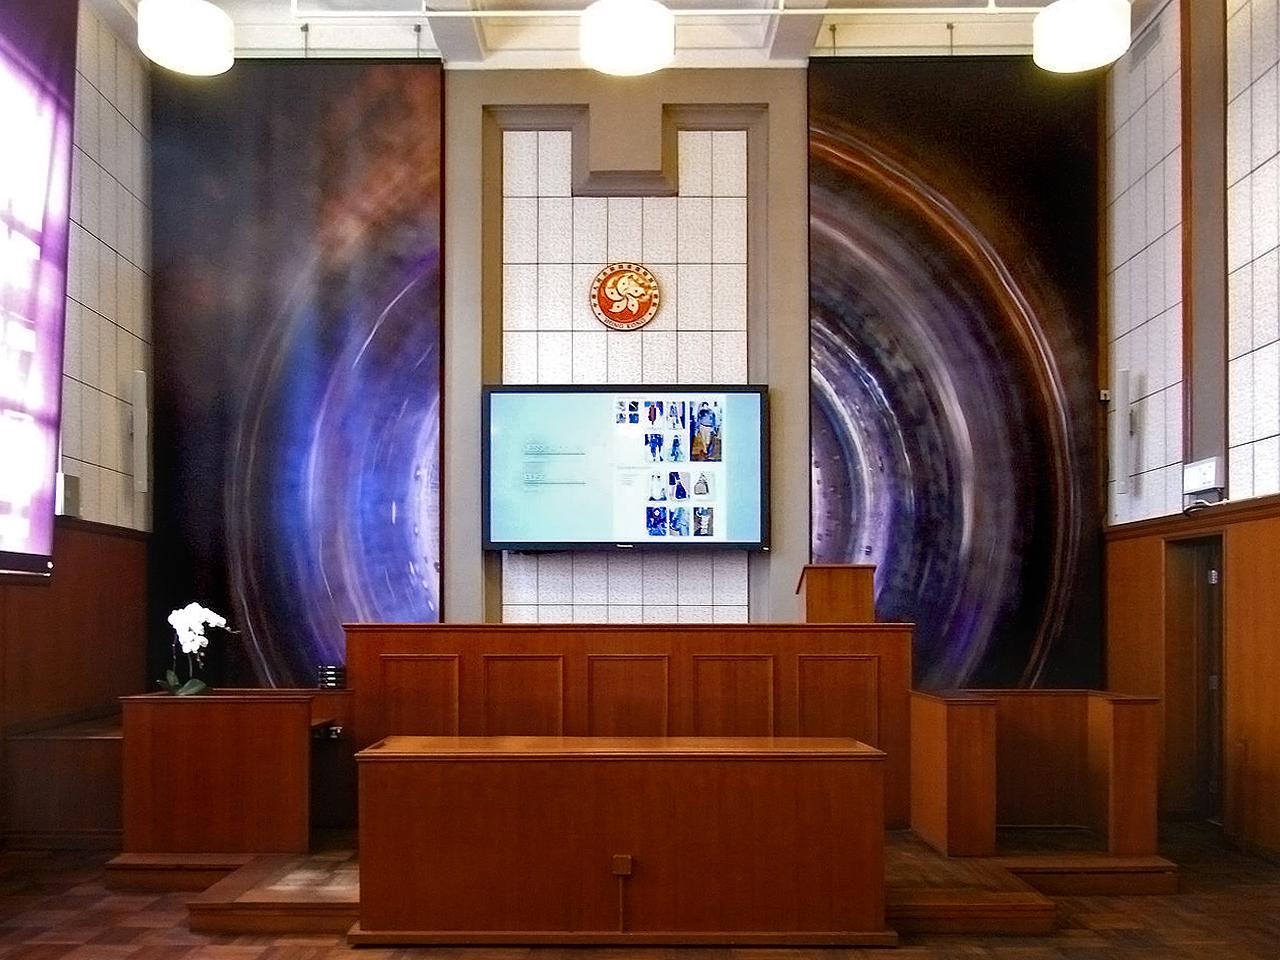 1280px-HK_292_Tai_Po_Road_SCAD_Hong_Kong_former_No1_Court_North_Kln_Magistracy_01_interior_April-2012.jpg